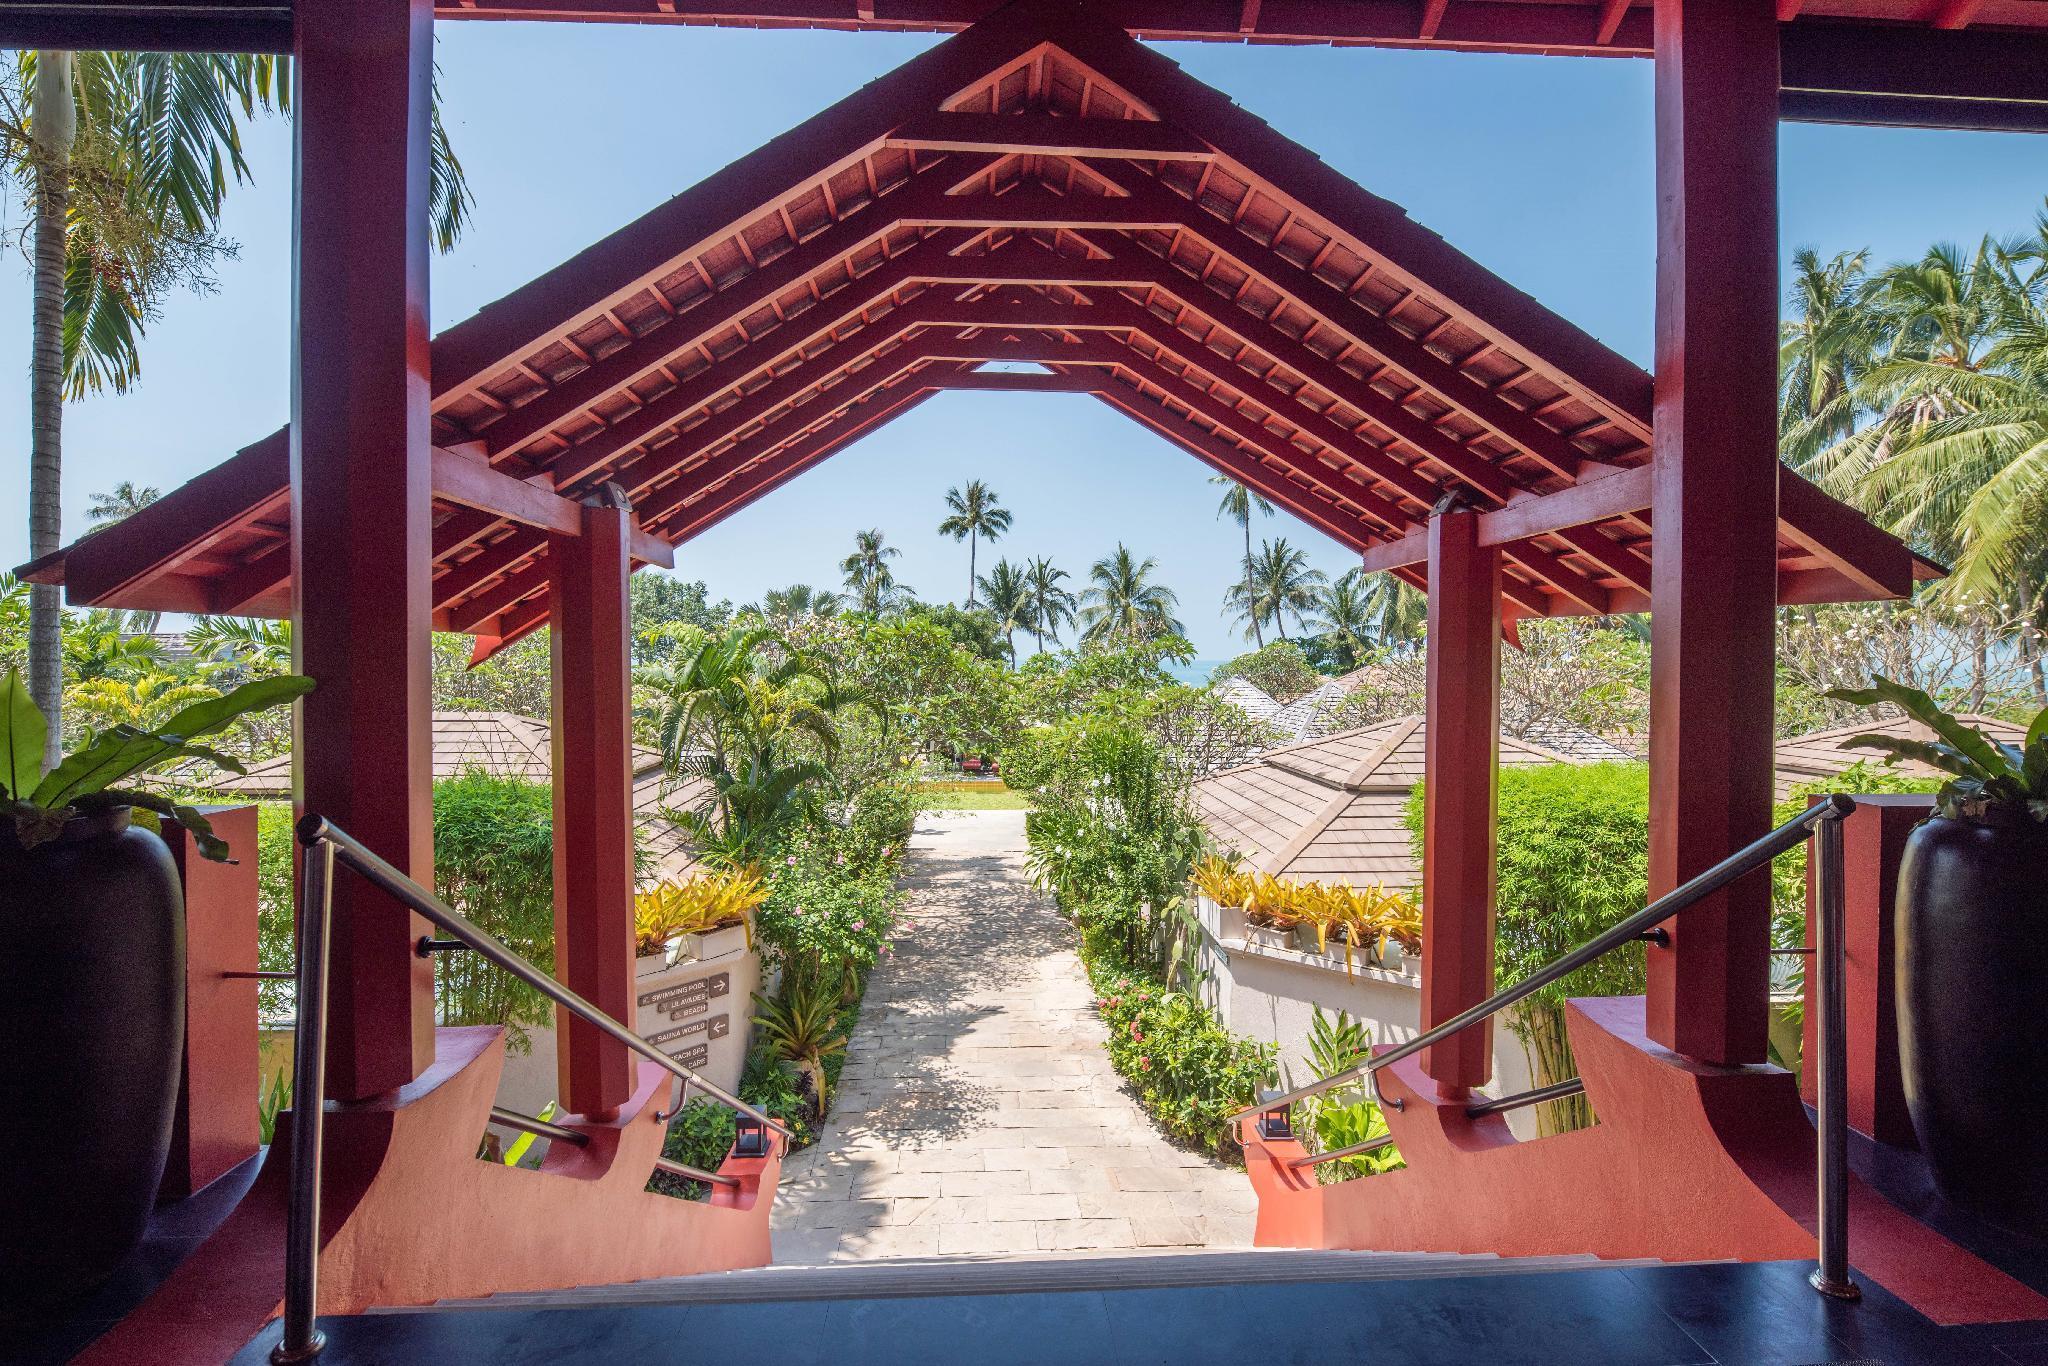 The Sunset Beach Resort & Spa Taling Ngam